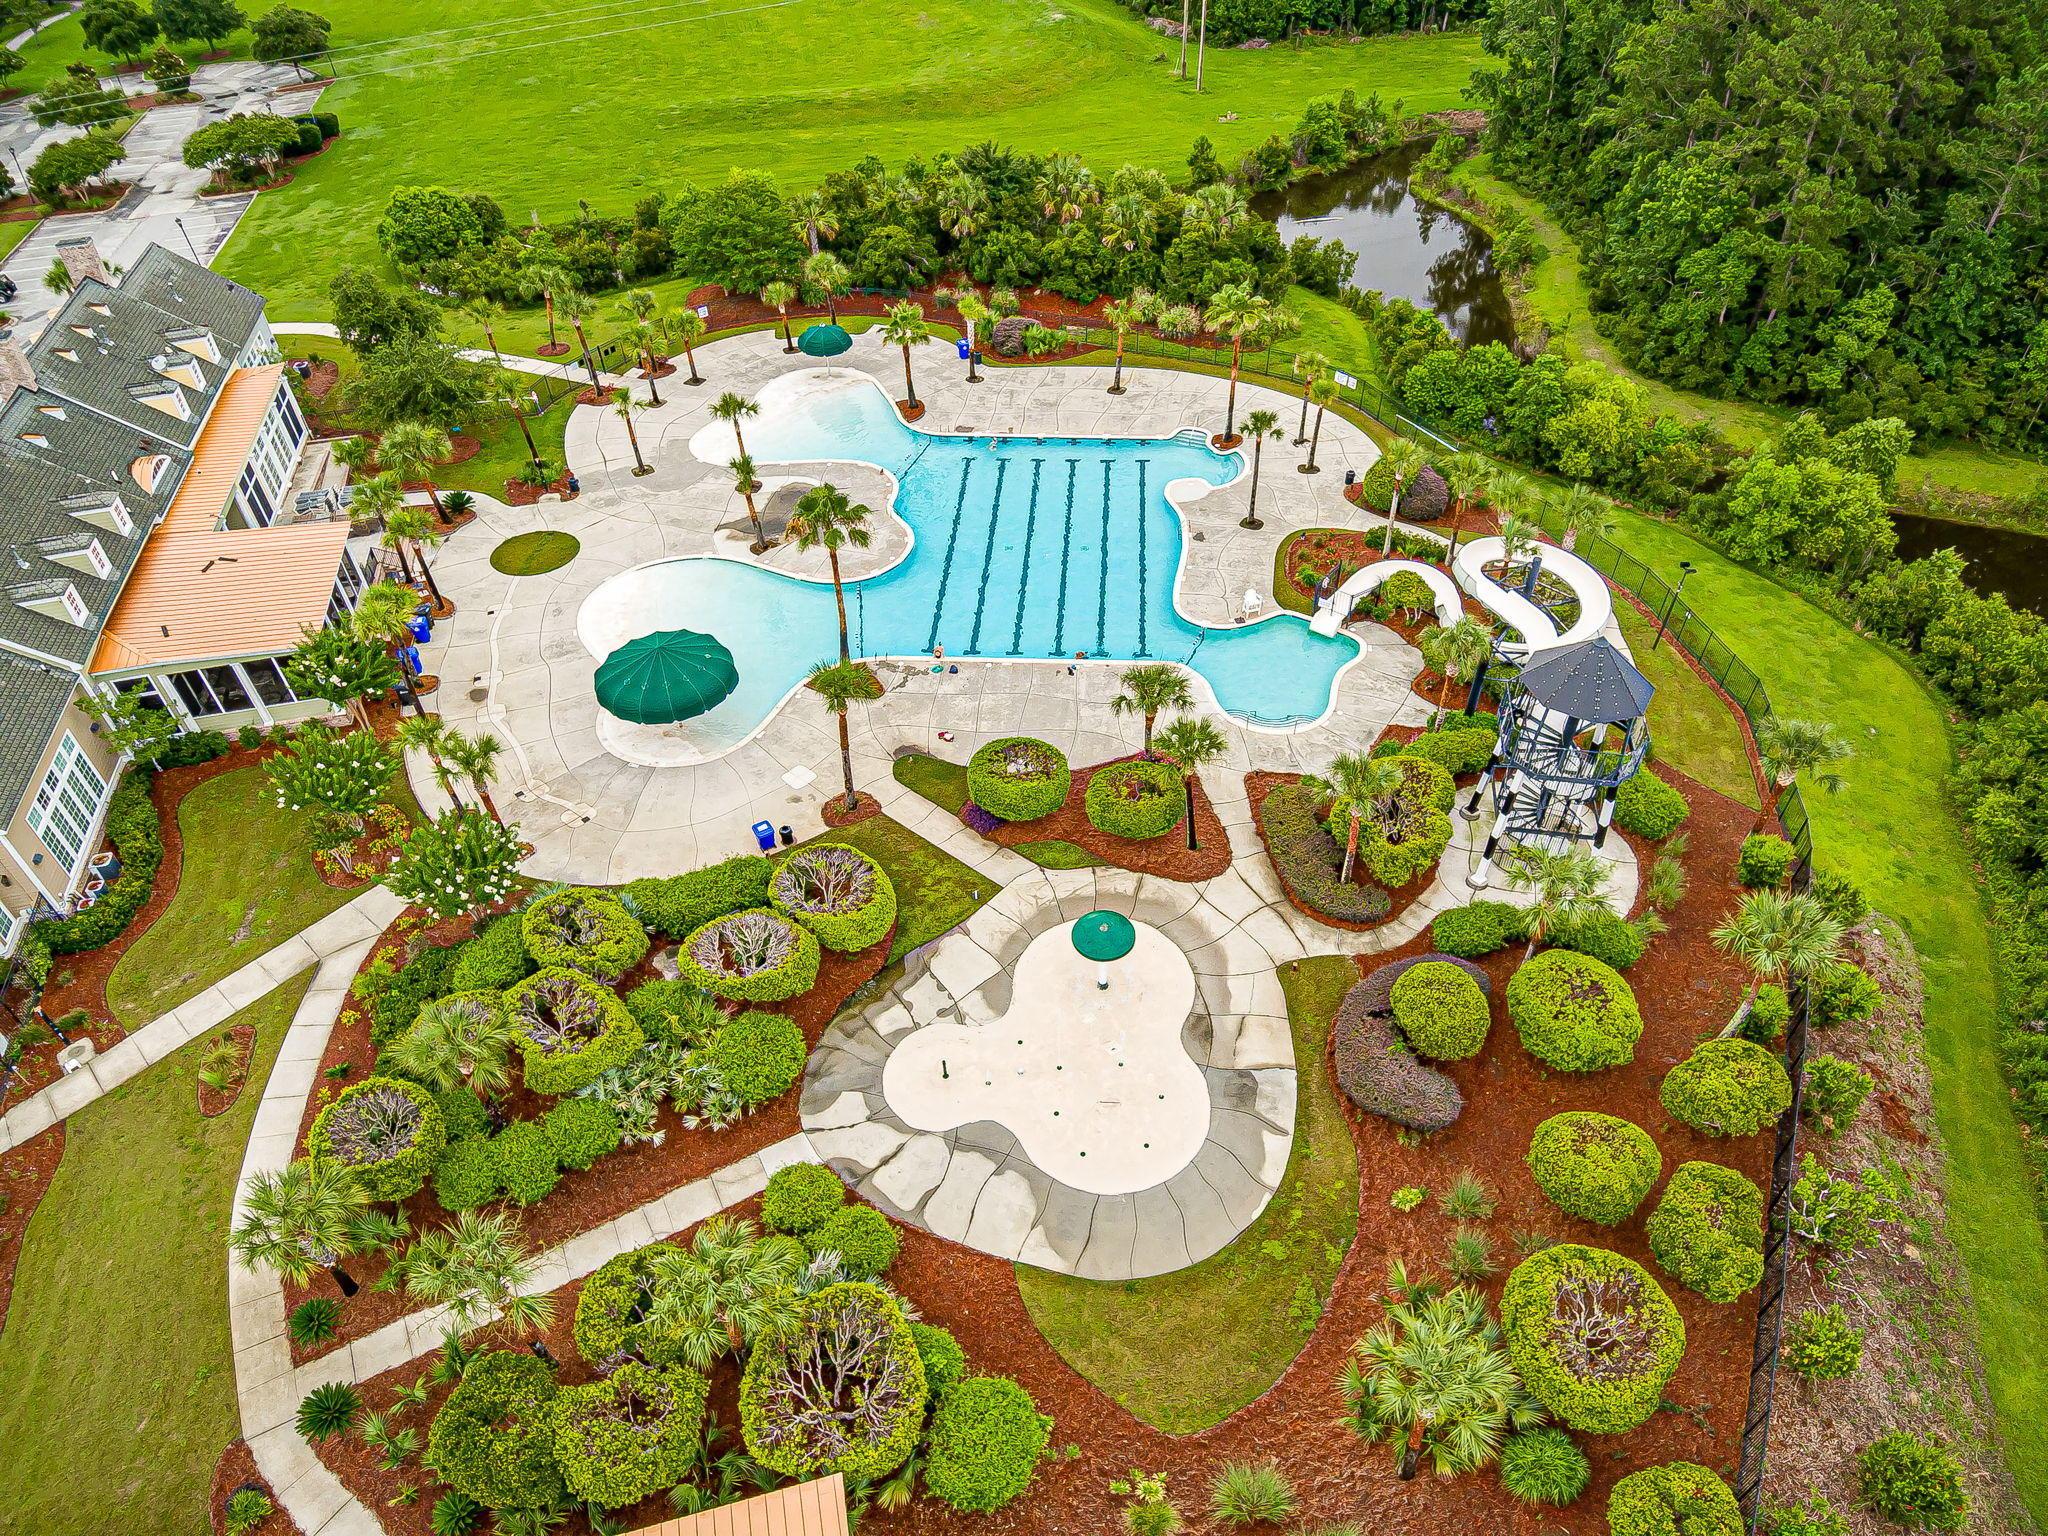 Dunes West Homes For Sale - 2476 Kings Gate, Mount Pleasant, SC - 16